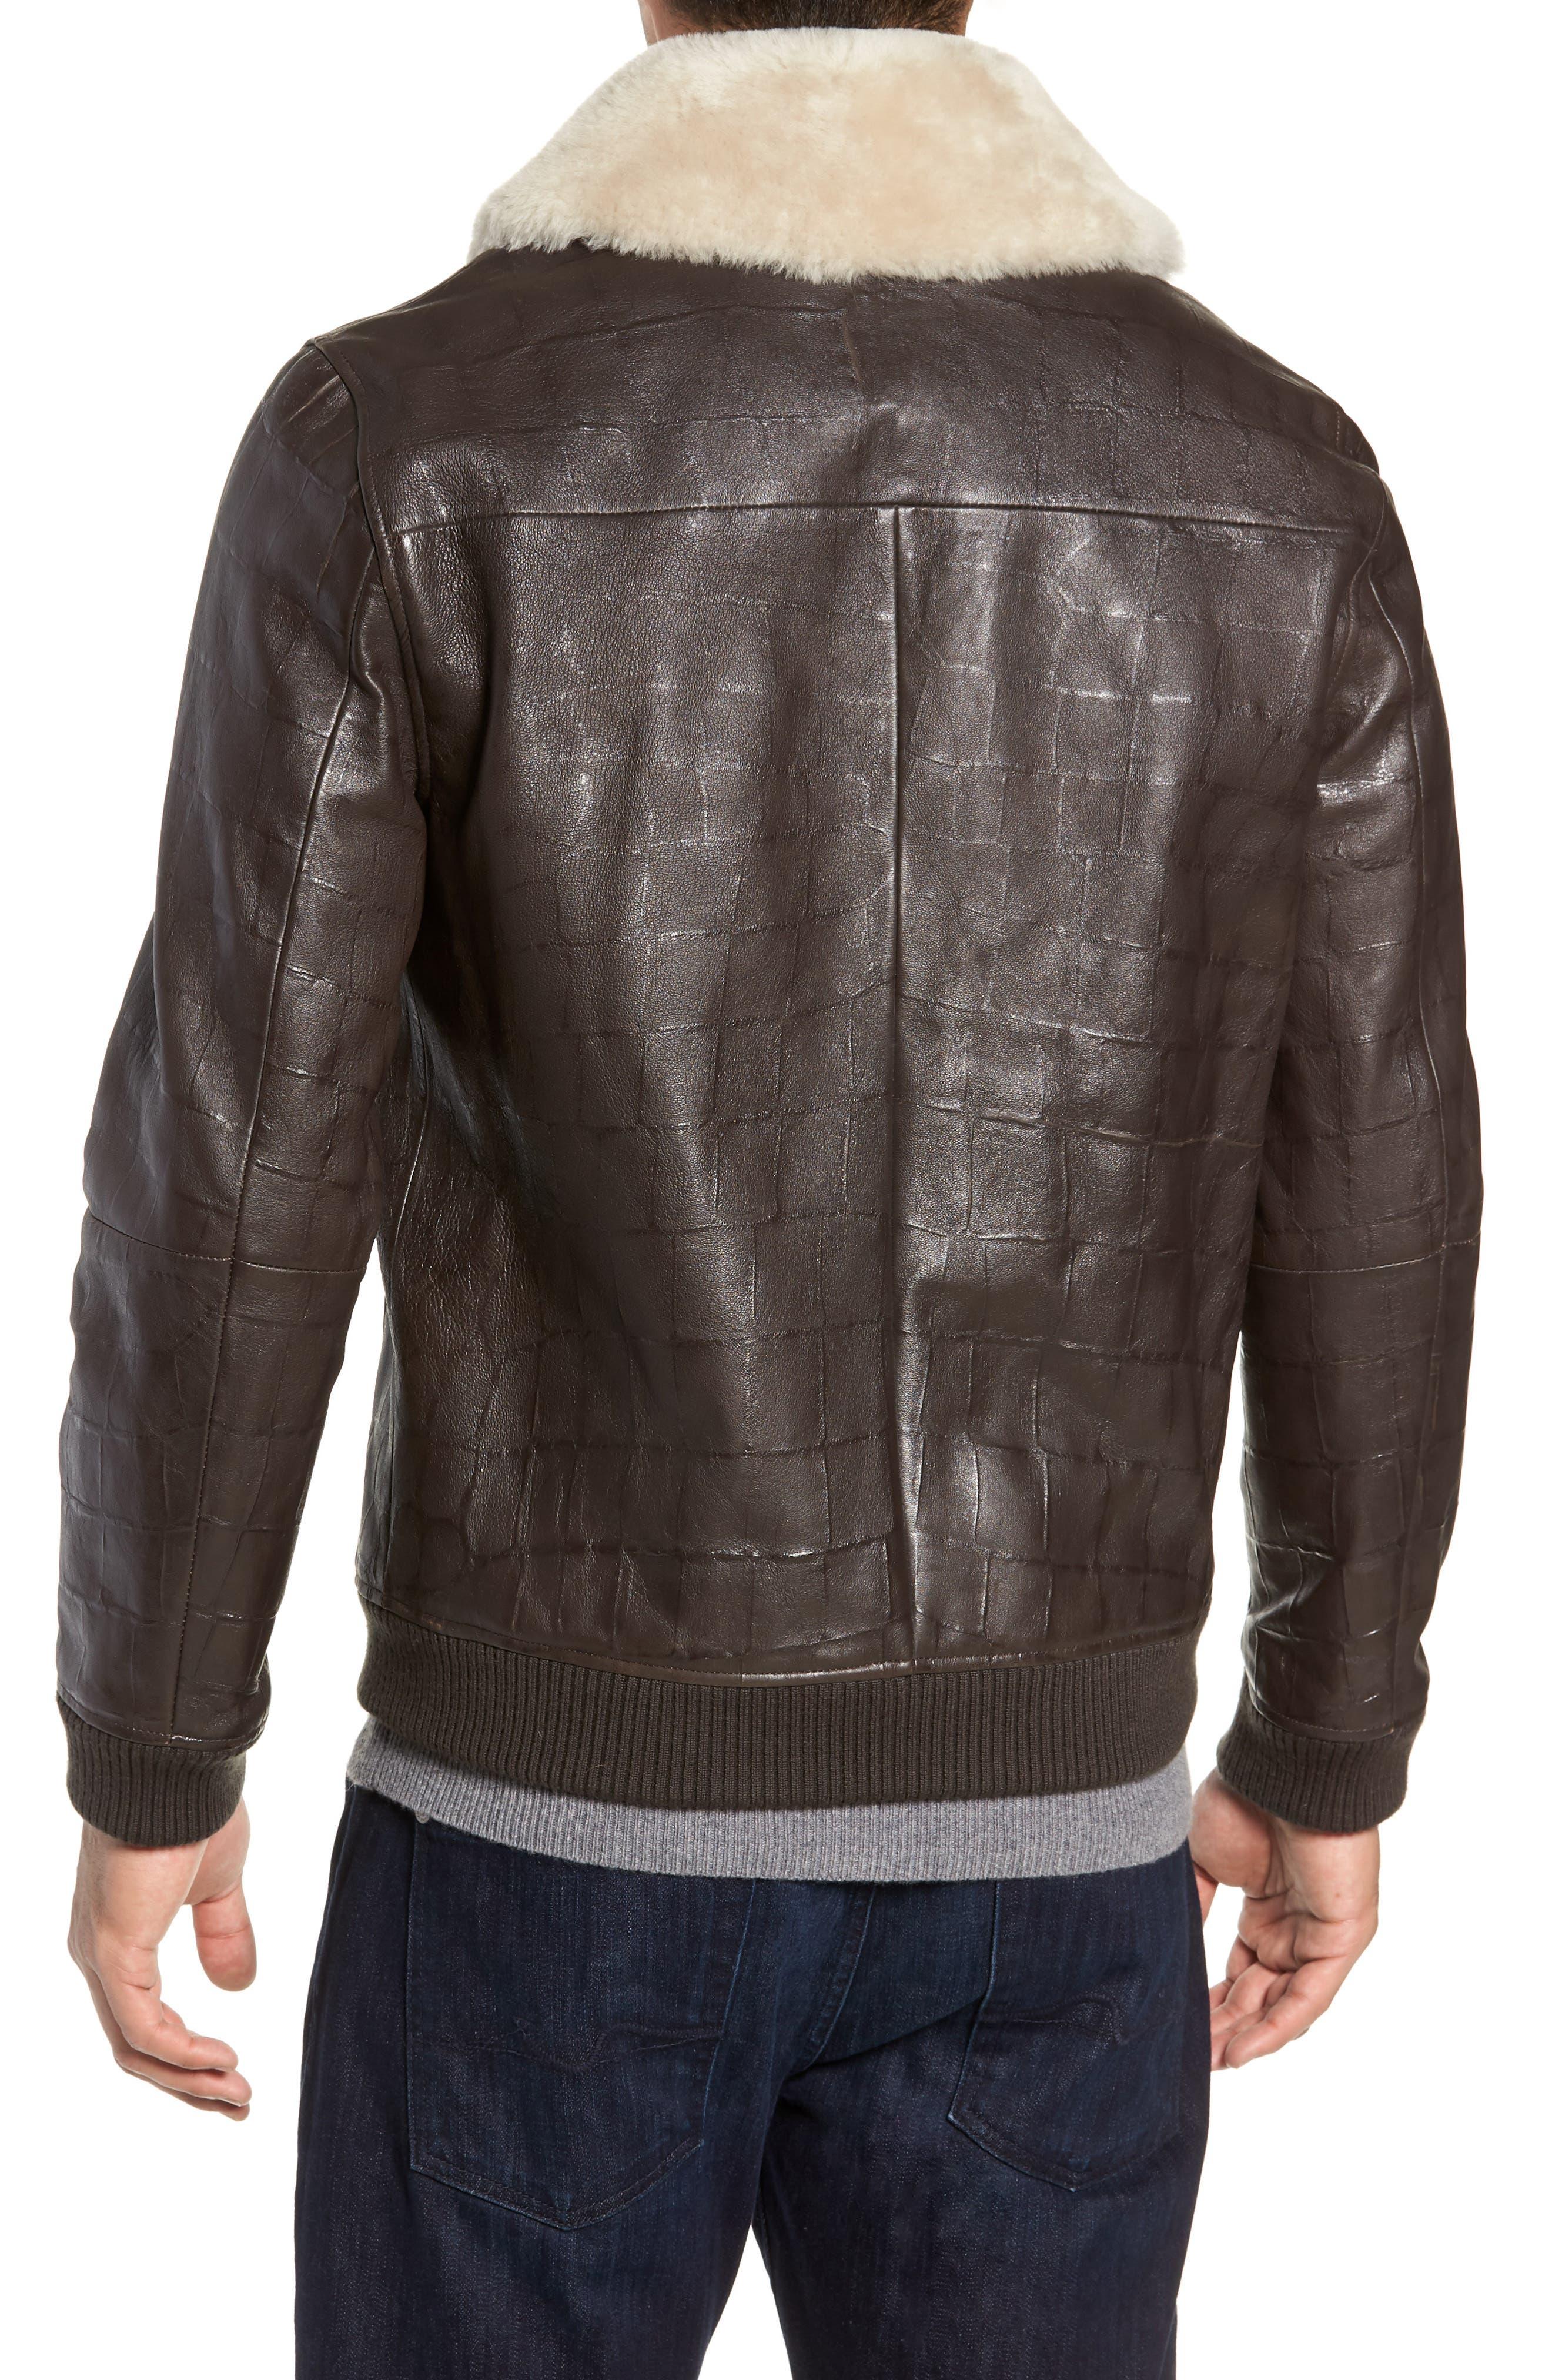 Corson Genuine Shearling Jacket,                             Alternate thumbnail 2, color,                             BROWN